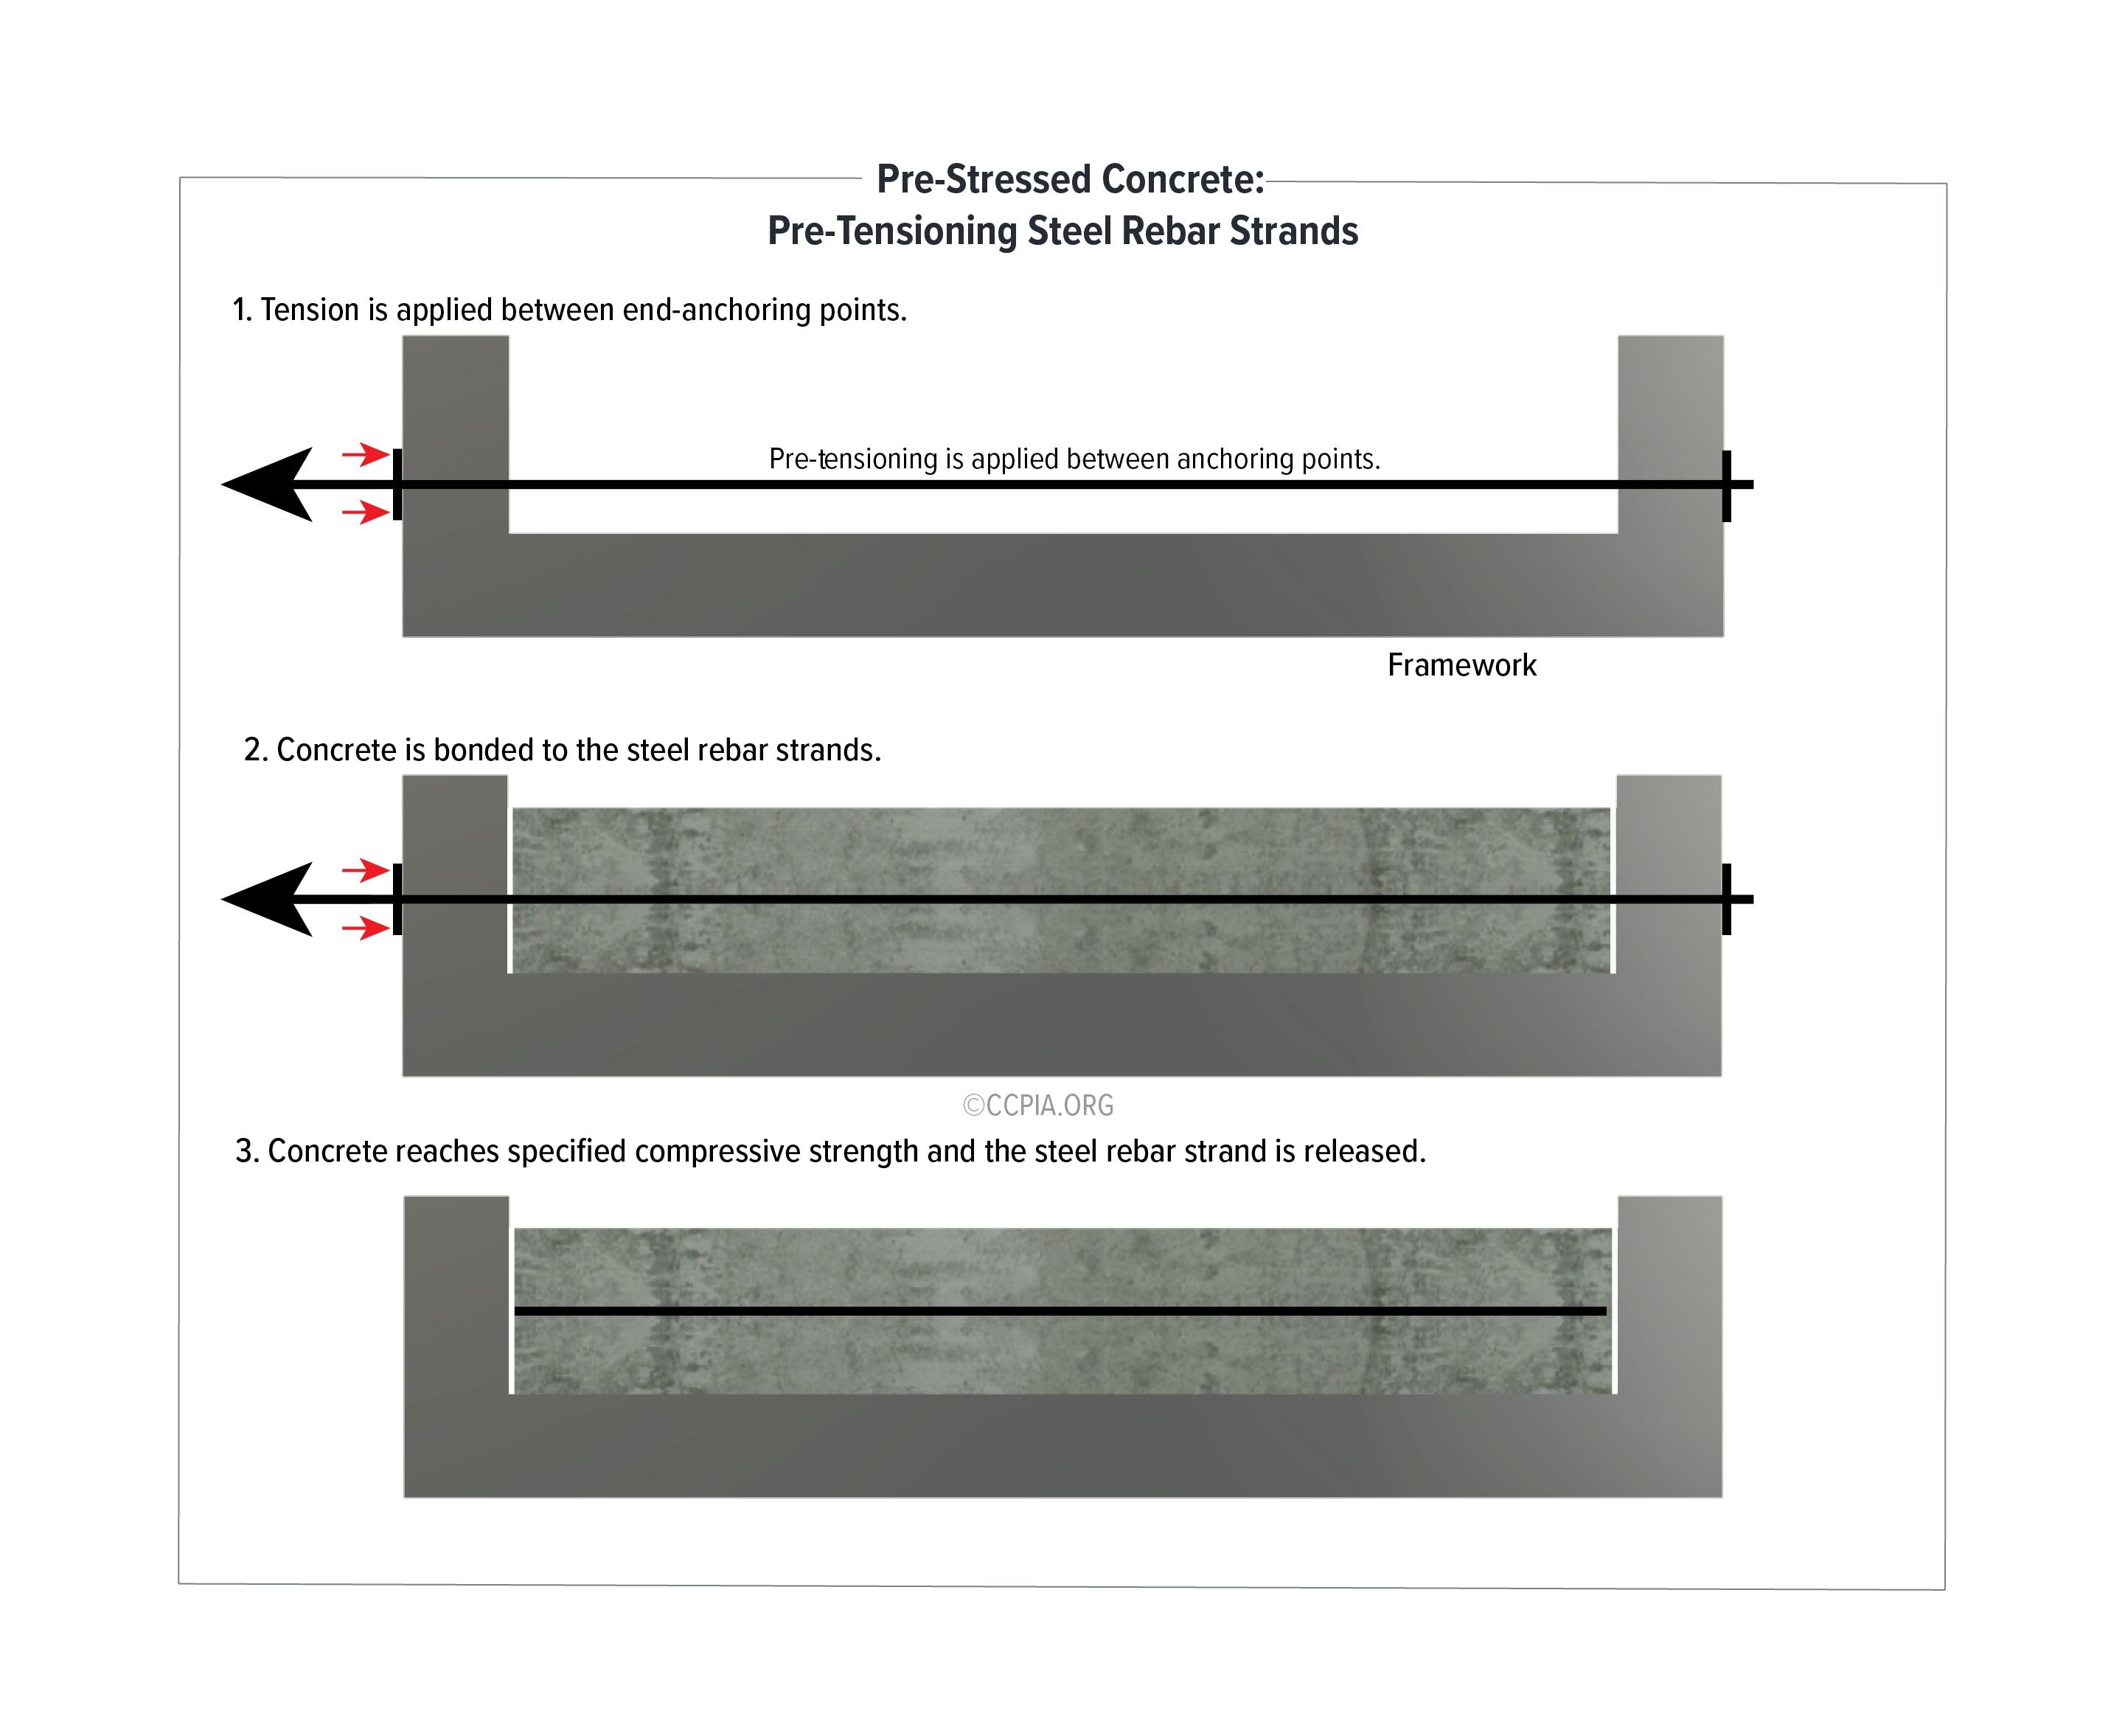 Pre-Stressed Concrete: Pre-Tensioning Steel Rebar Strands